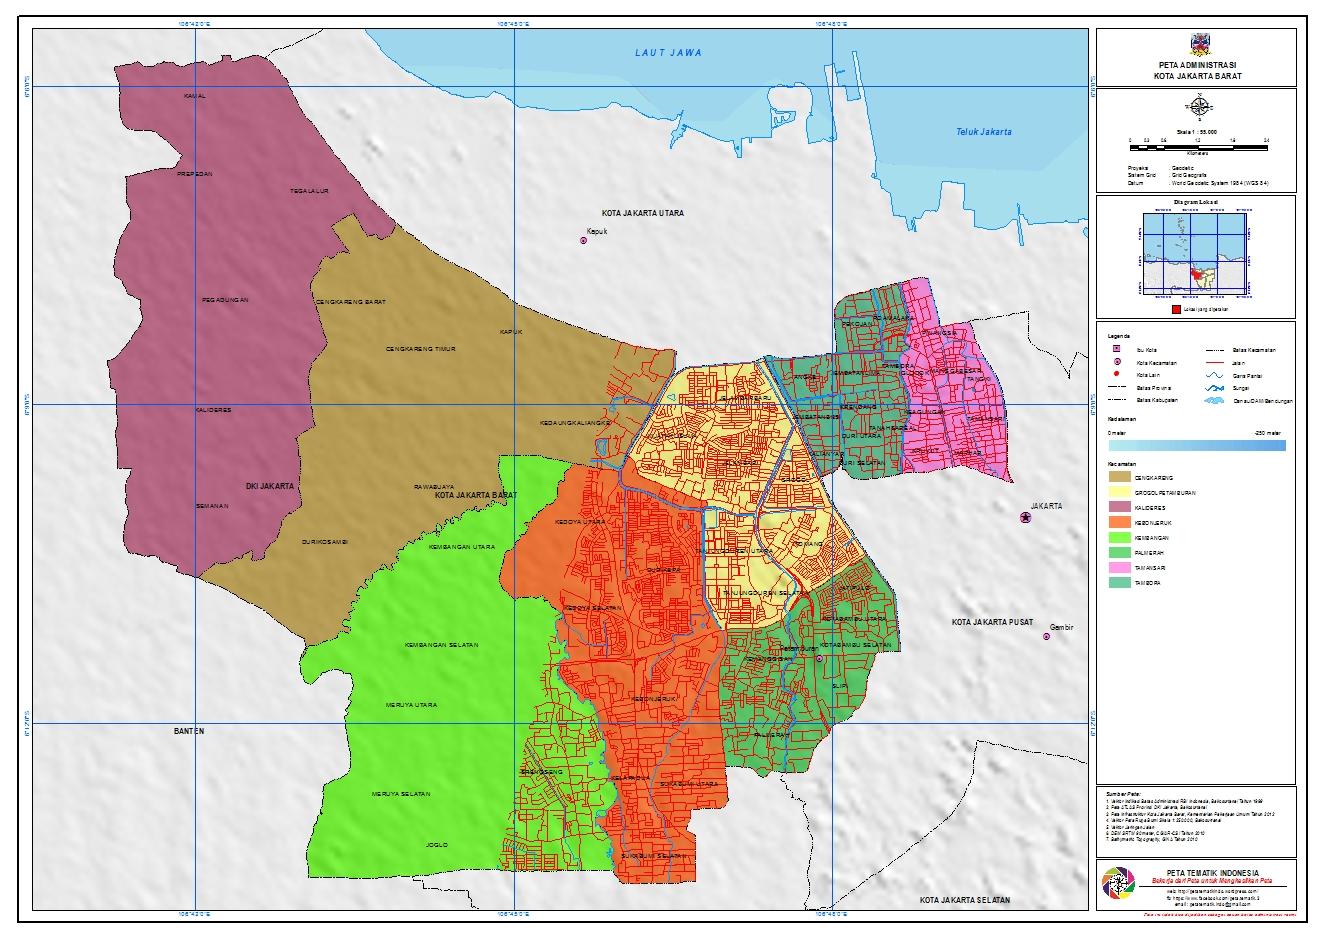 Kota Administrasi Jakarta Barat Infonusa Wordpress Kepulauan Seribu Utara